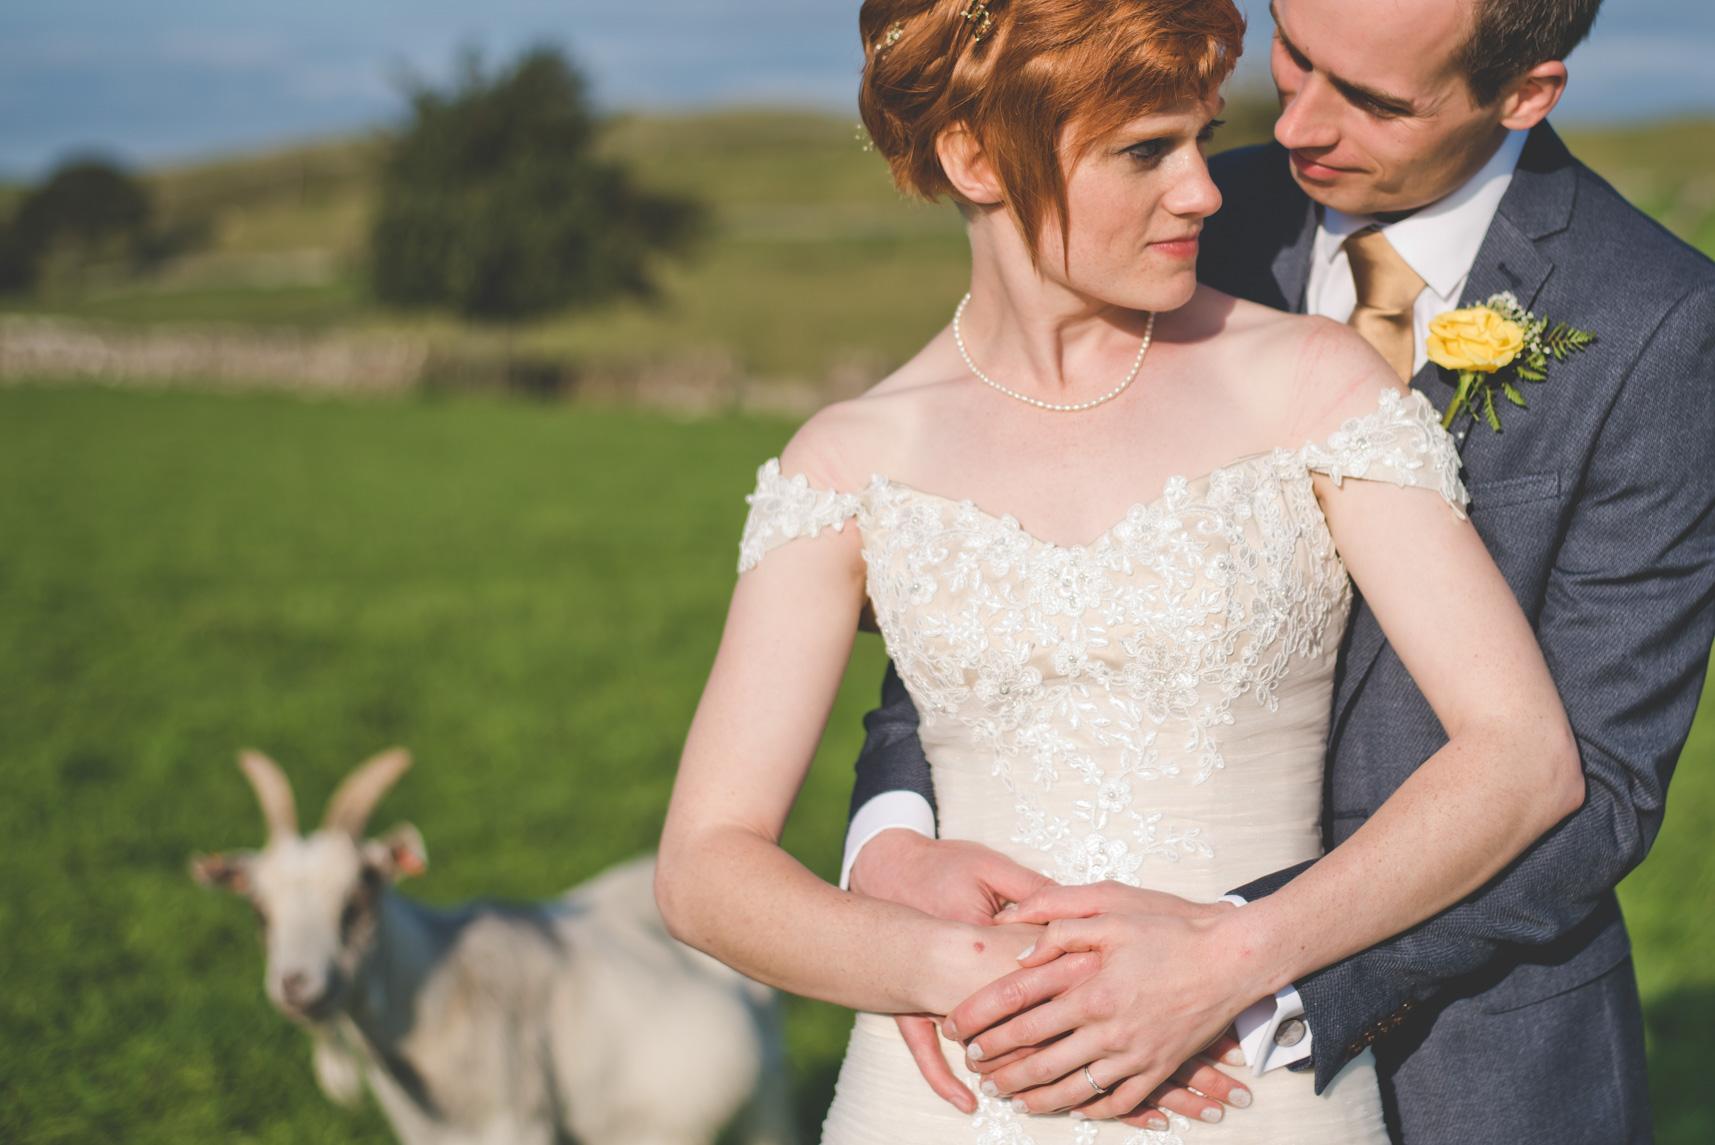 Peak+district+farm+wedding+lower+damgate+photographer-185.jpg